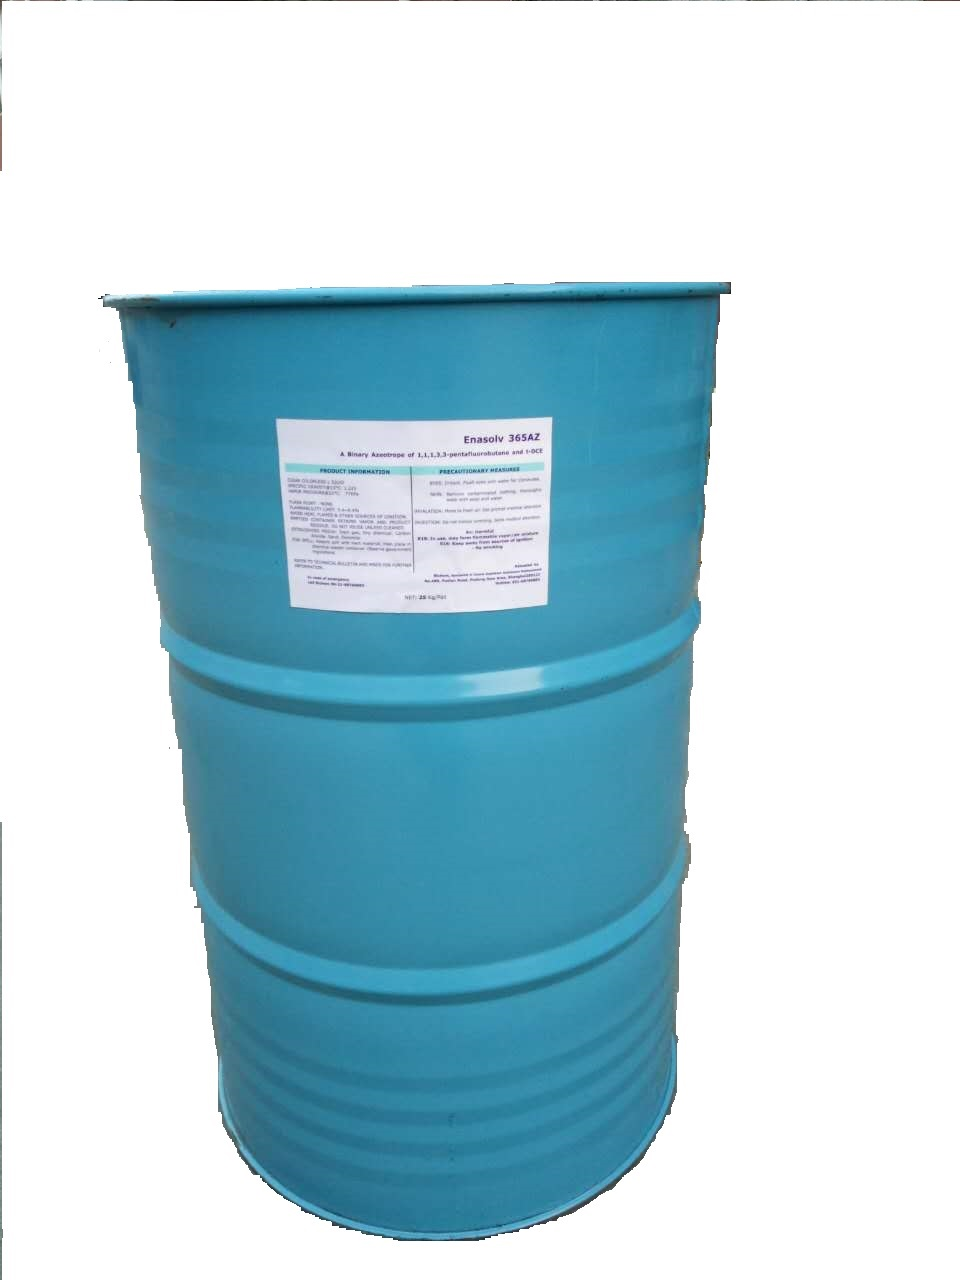 Enasolv 365AZ硅油稀释剂 可万博官方网址电脑版R141B用